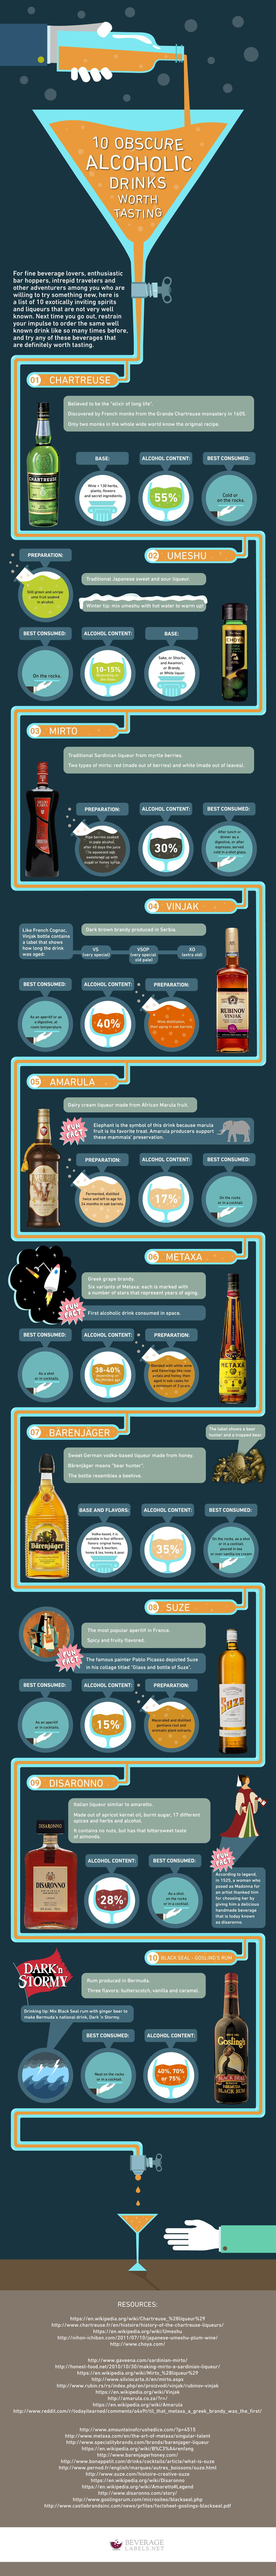 Infographic 10 vreemde drankjes die je moet proeven